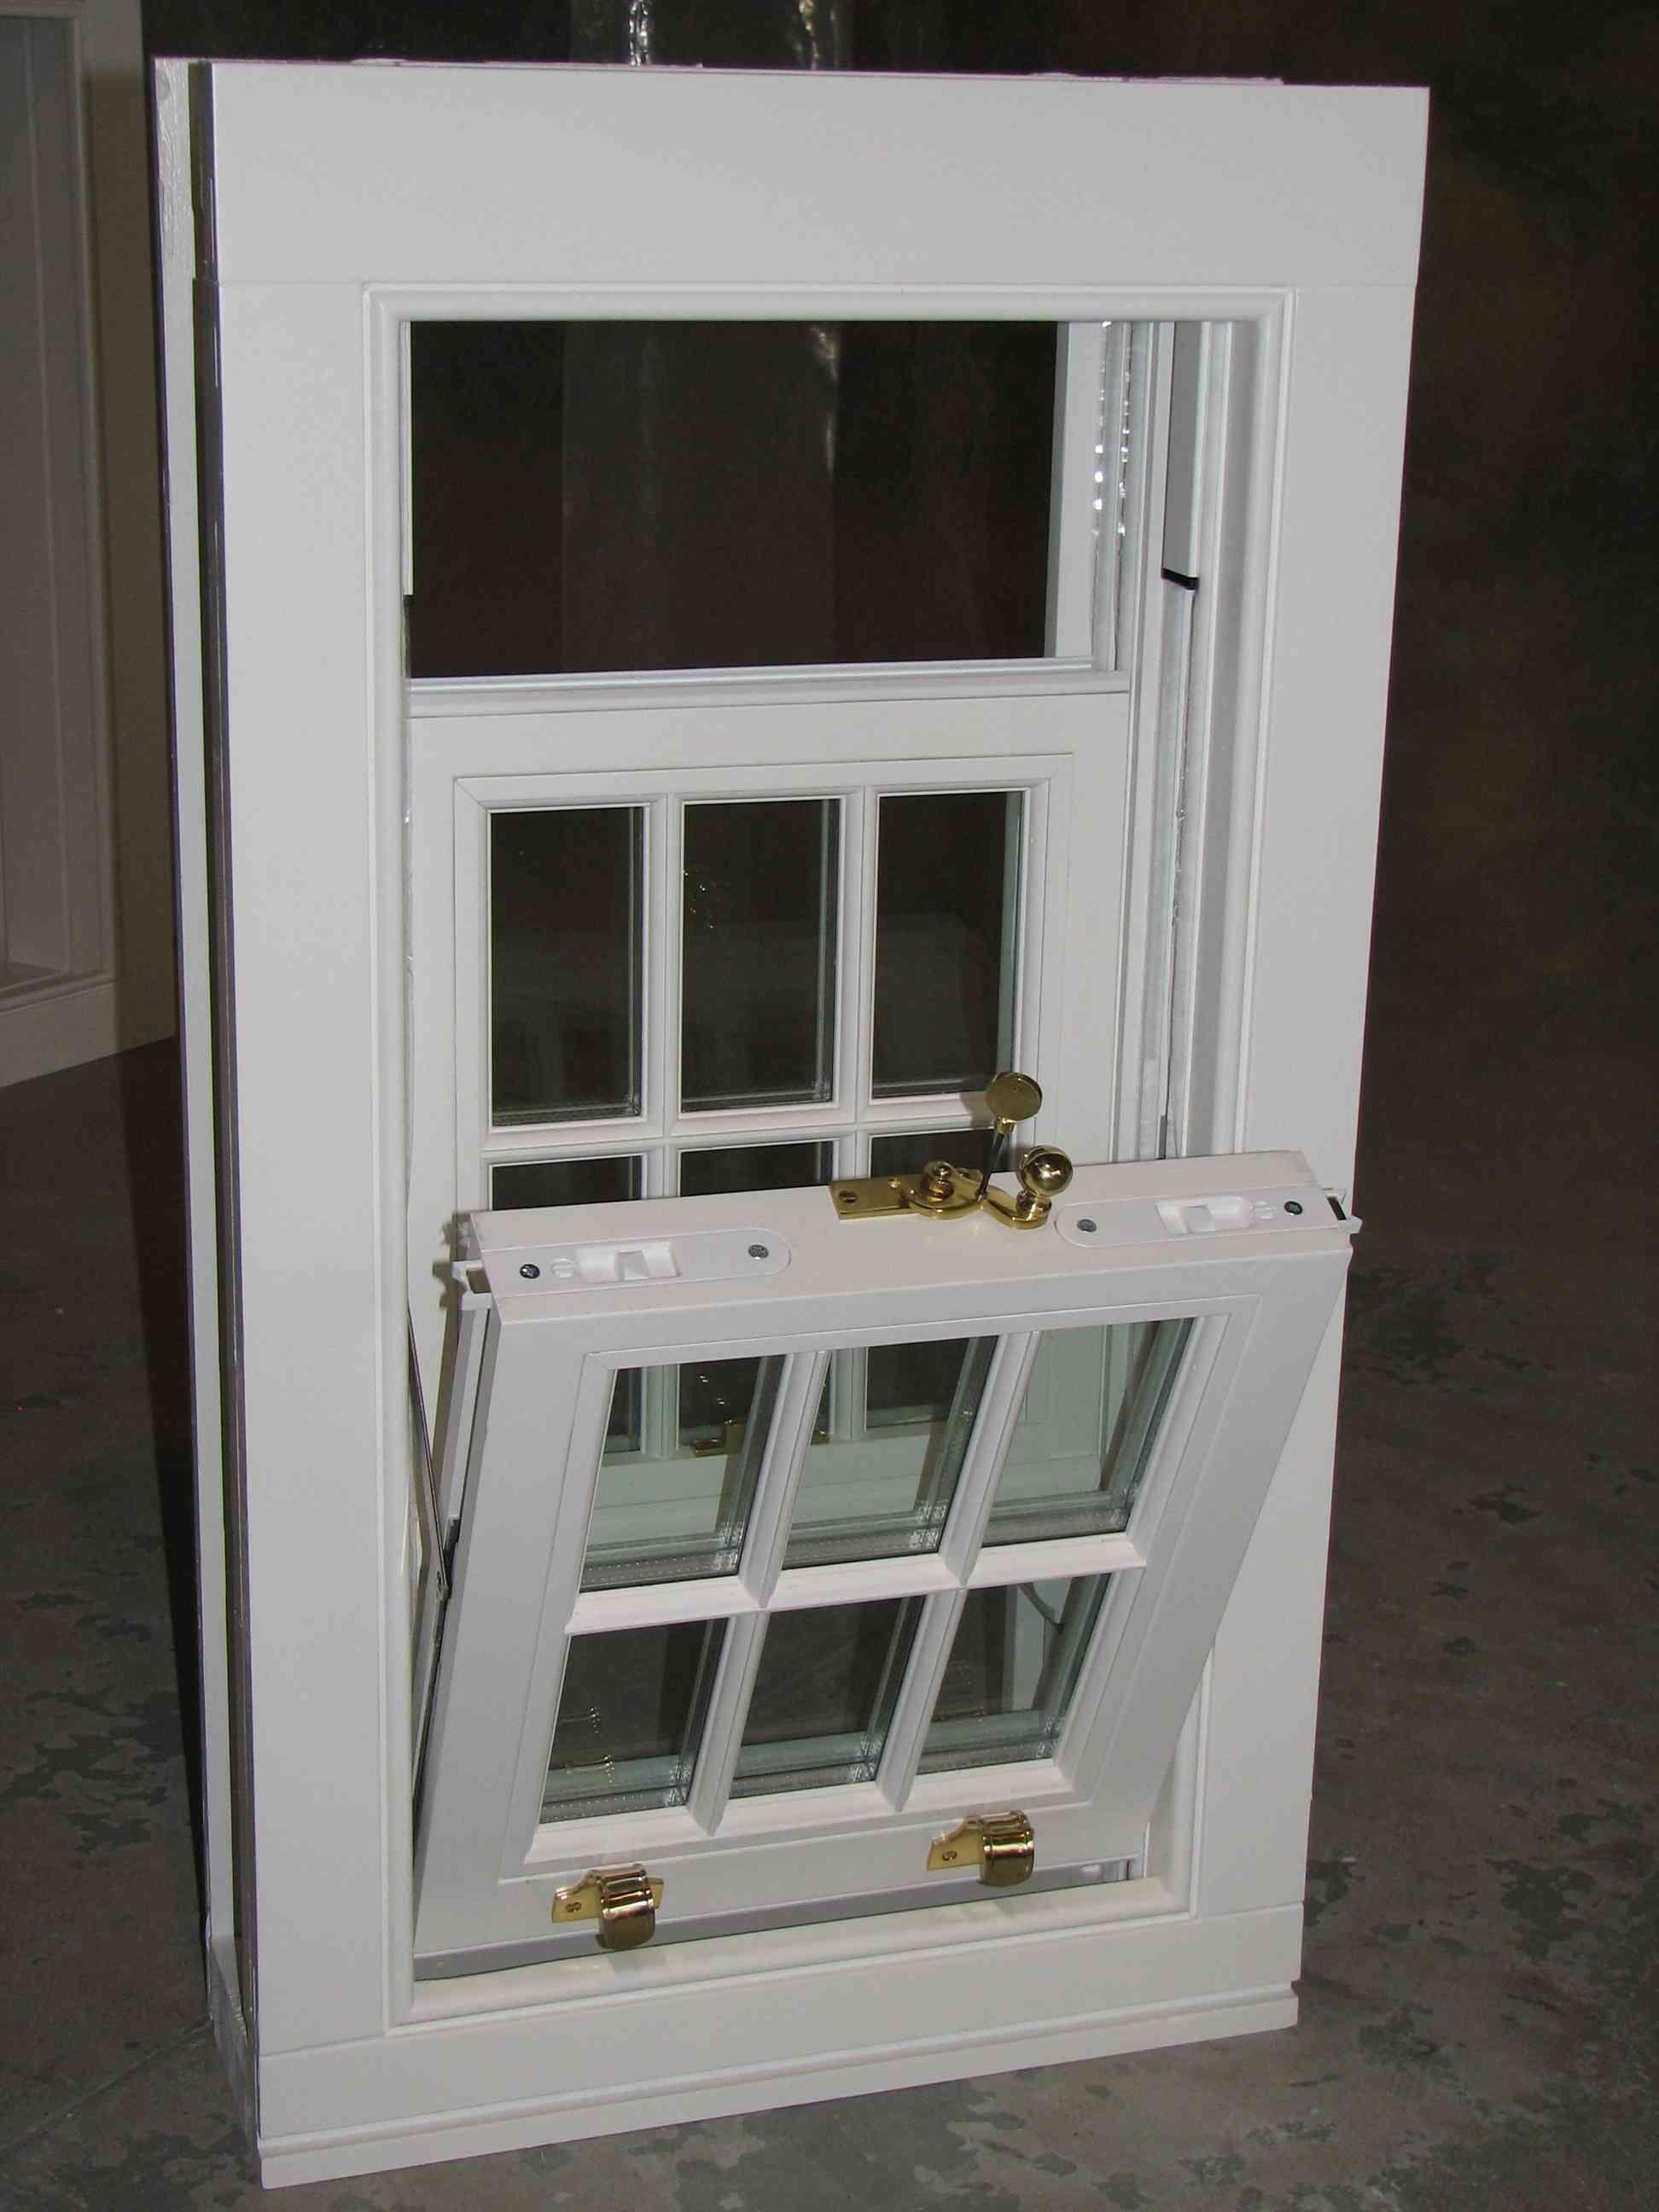 #302C27 Madeira janelas de guilhotina Windows ID do produto:100246014  148 Janelas De Vidro Guilhotina